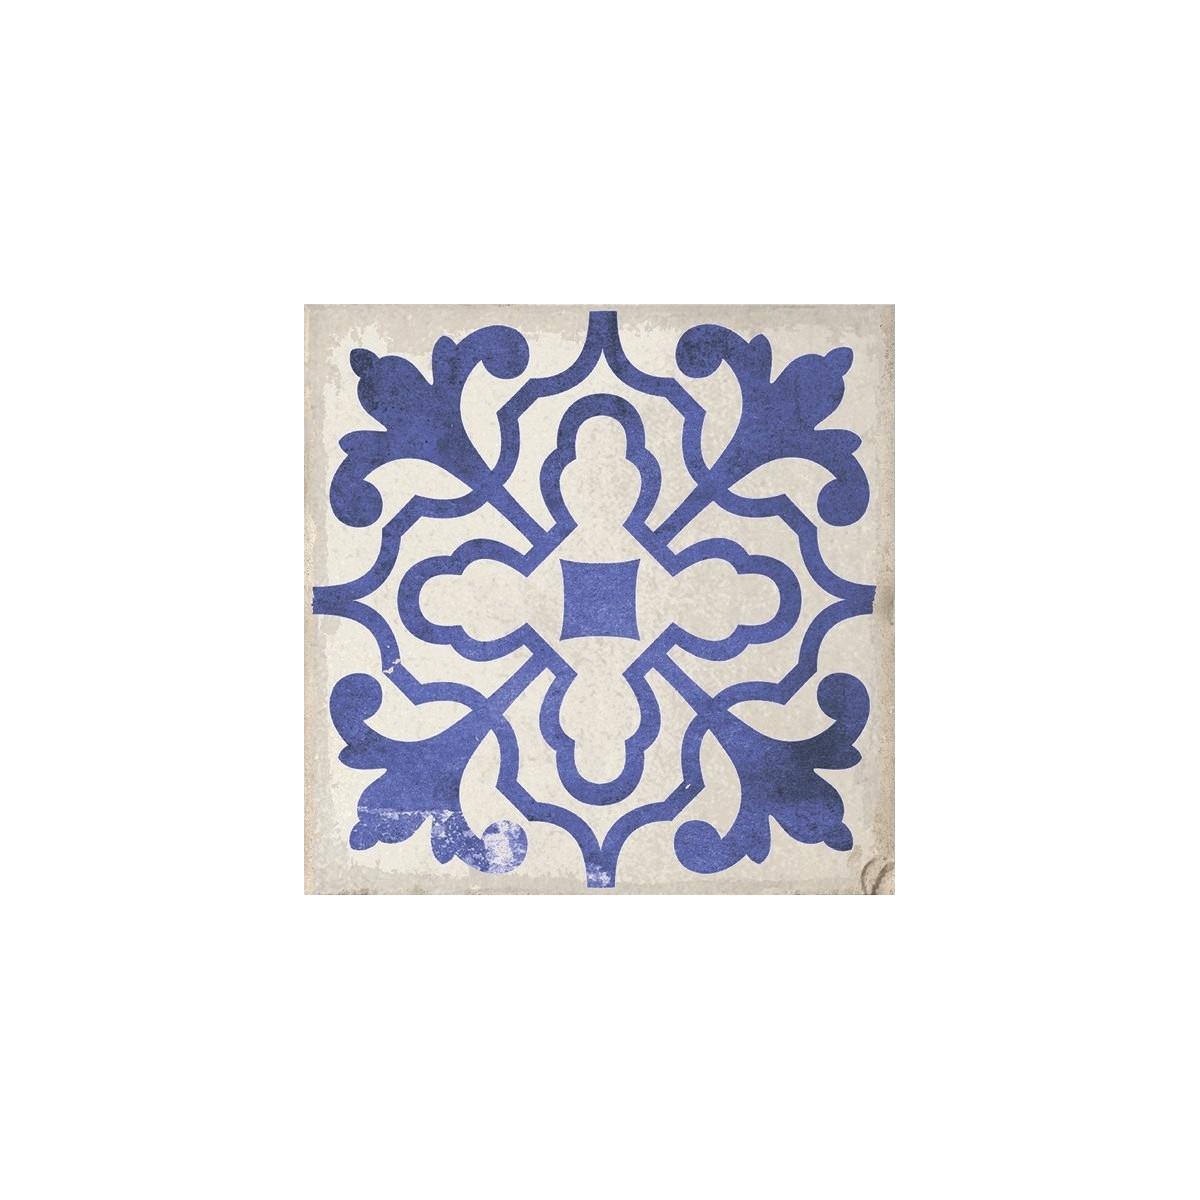 Baldosa porcelánica de imitación Hidraúlica con motivos decorativos azules sobre fondo blanco Villena Blue 15x15 (caja) barato